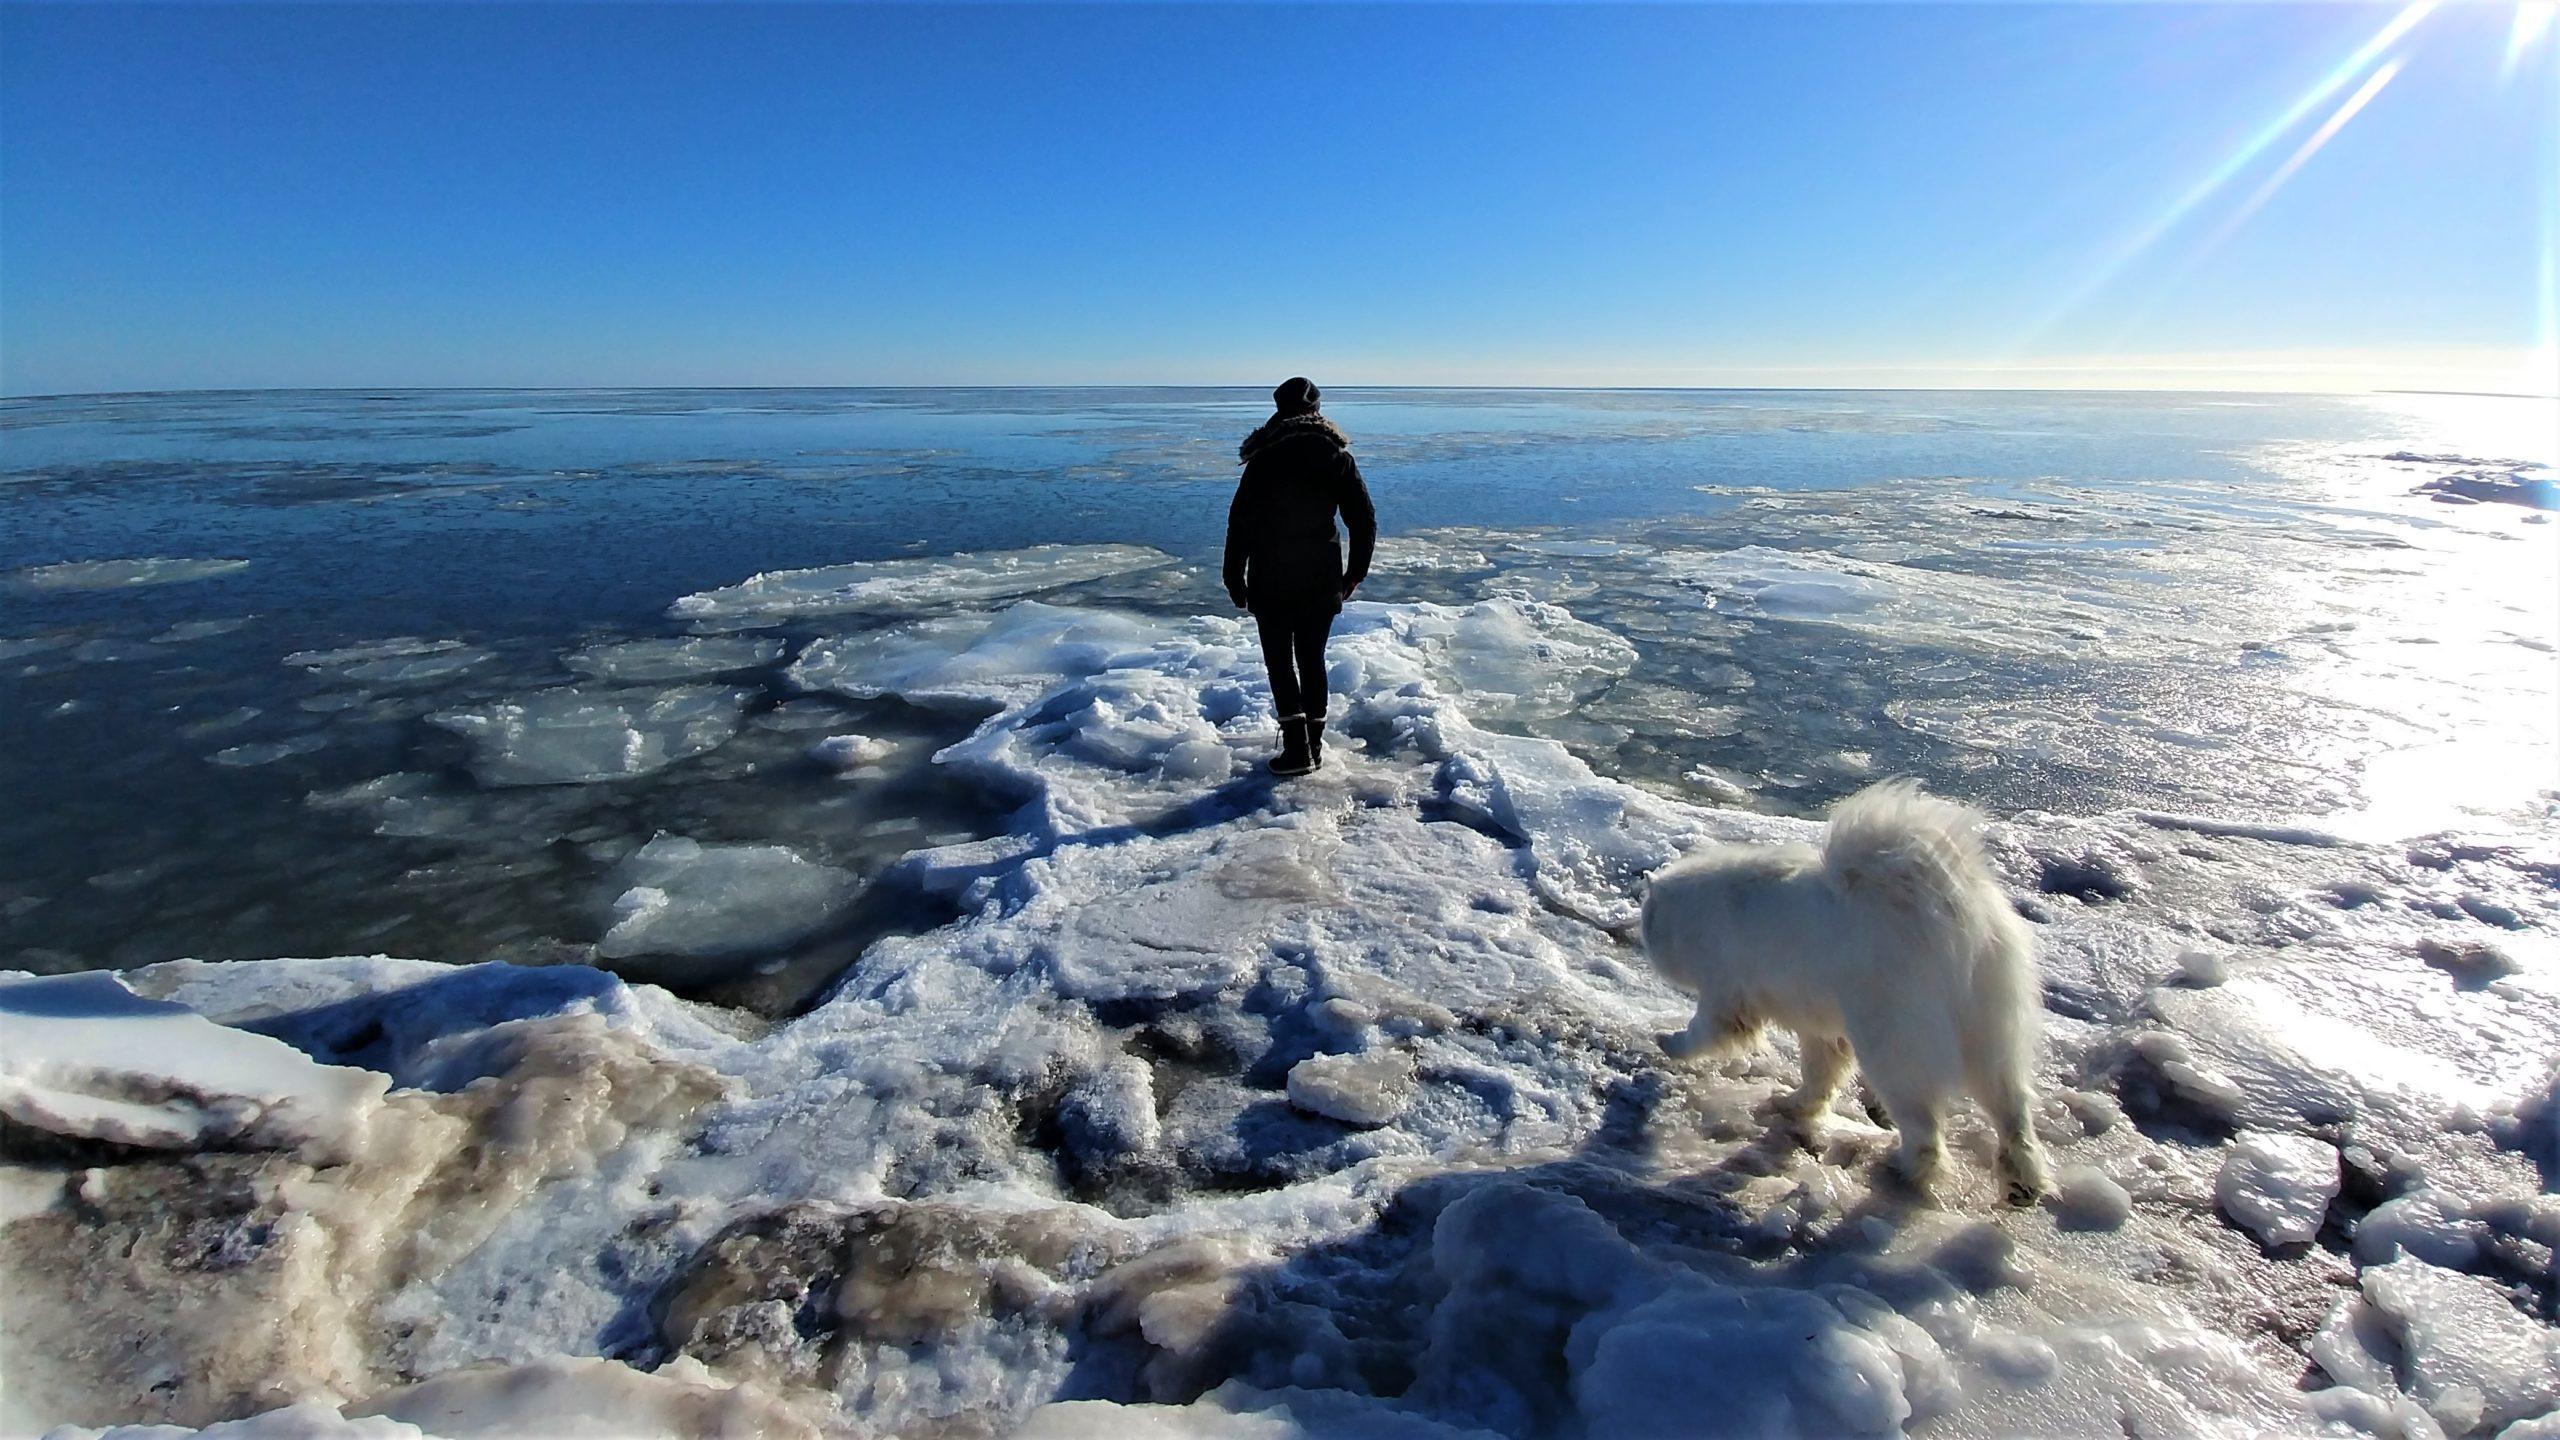 Canada hiver tempete que faire road-trip blog voyage arpenter le chemin